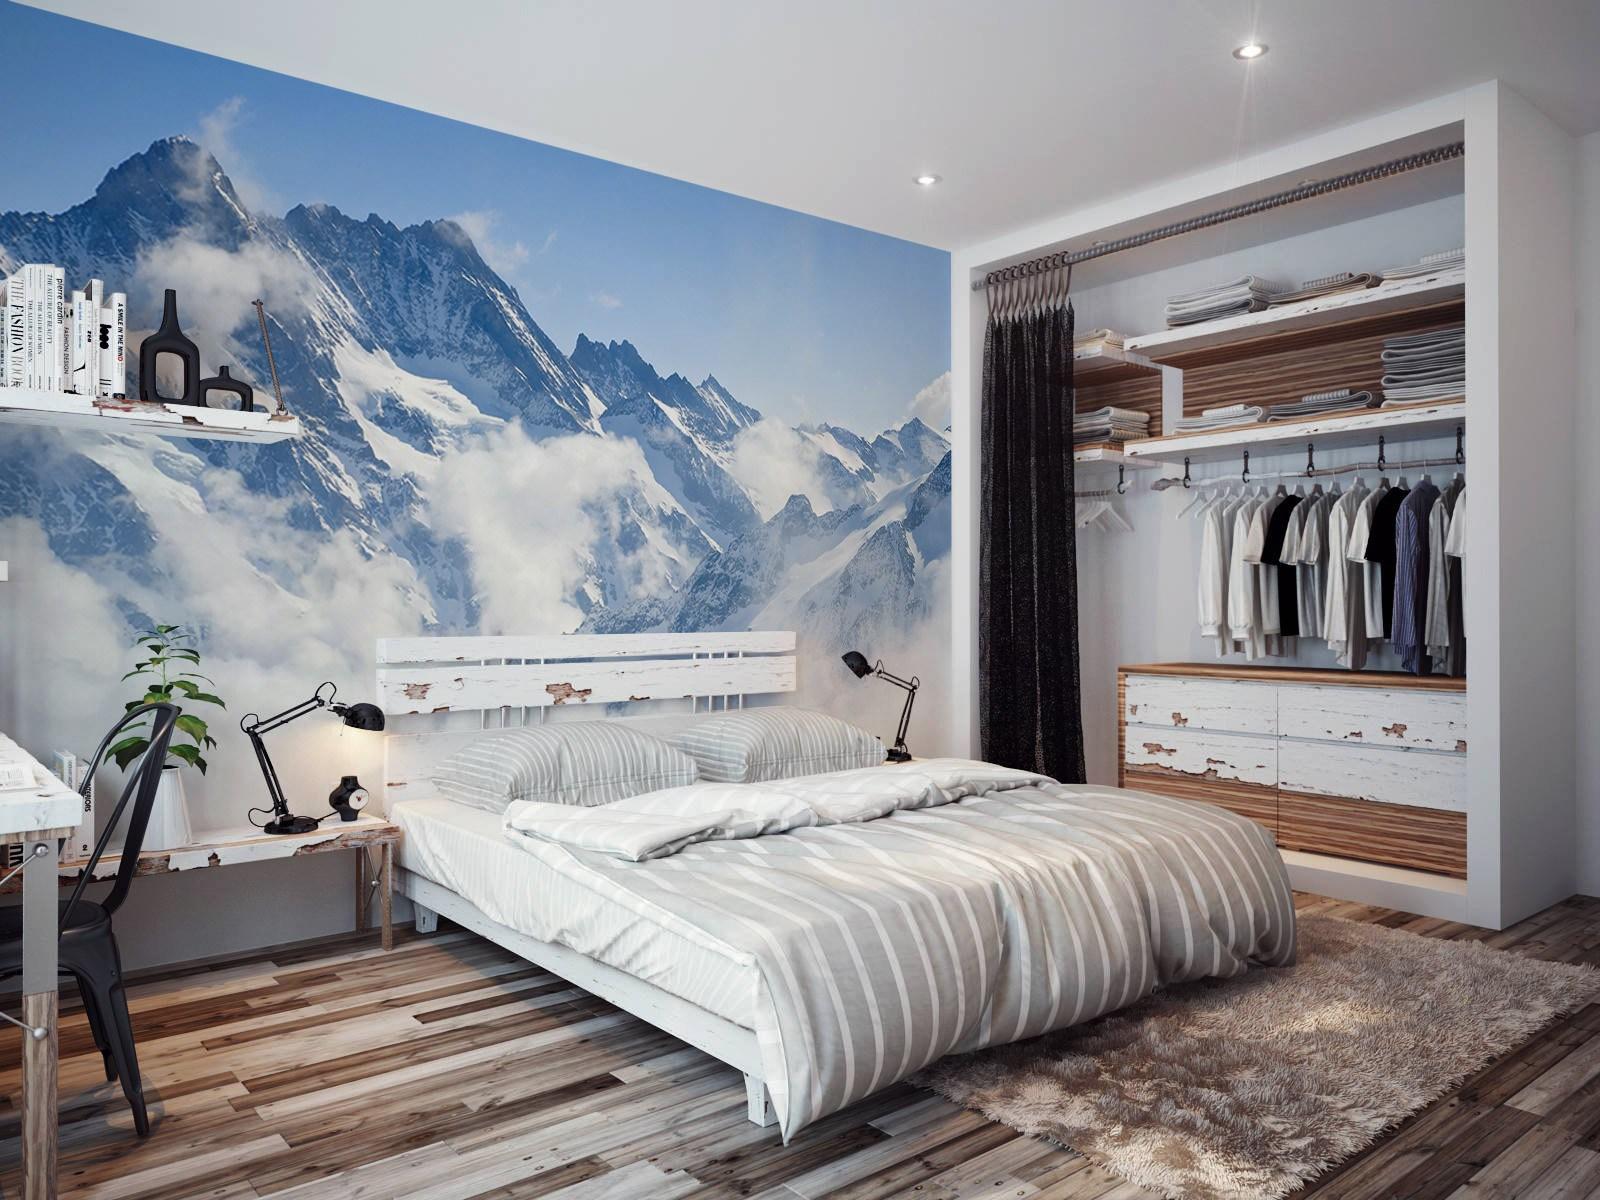 بالصور ورق جدران غرف نوم , واااو ورق جدران محصلش 5190 9